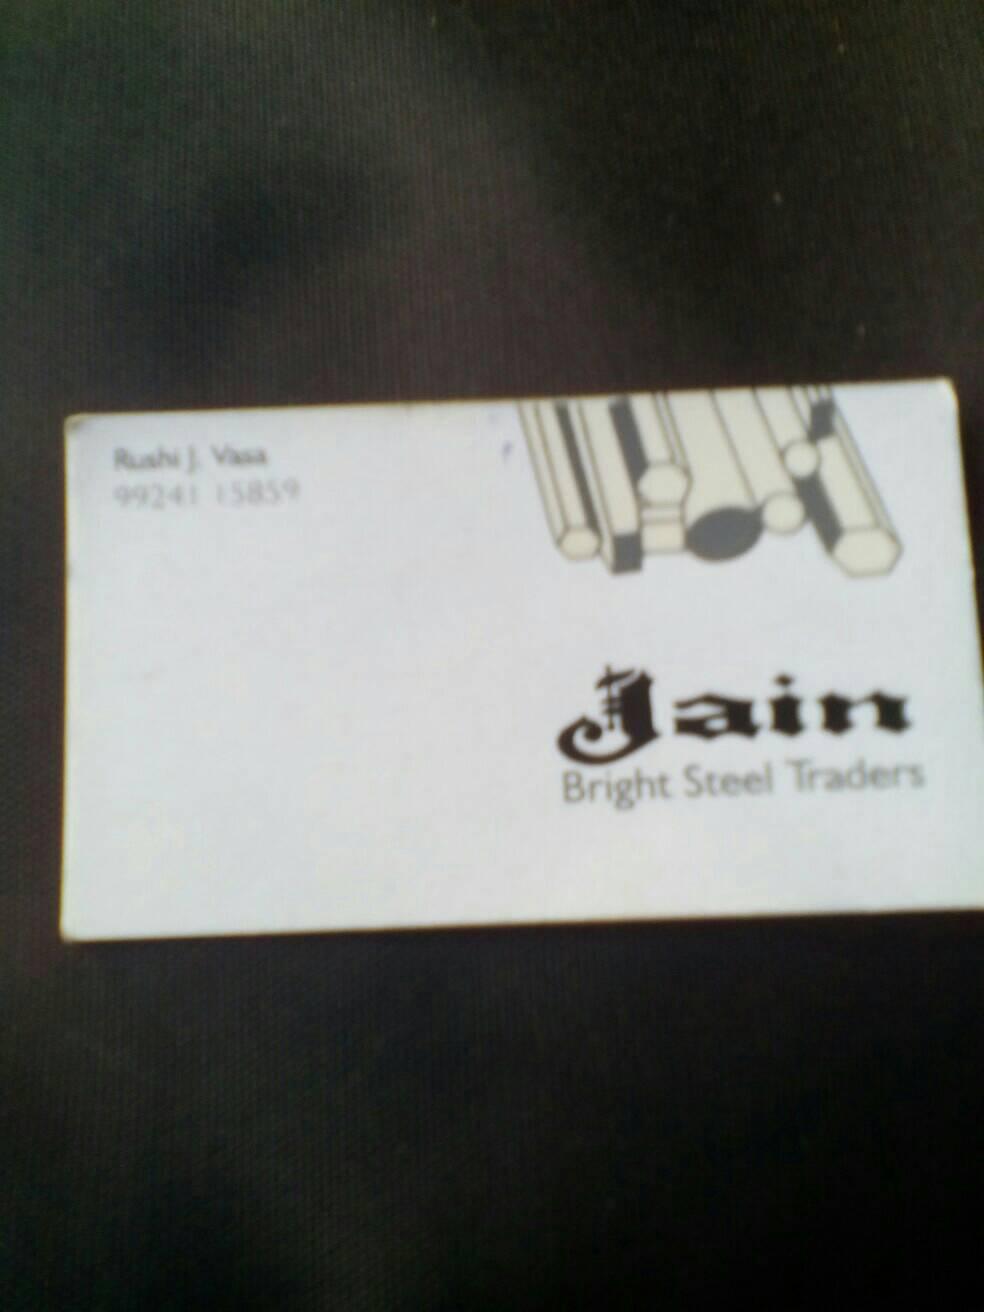 Jain Steel